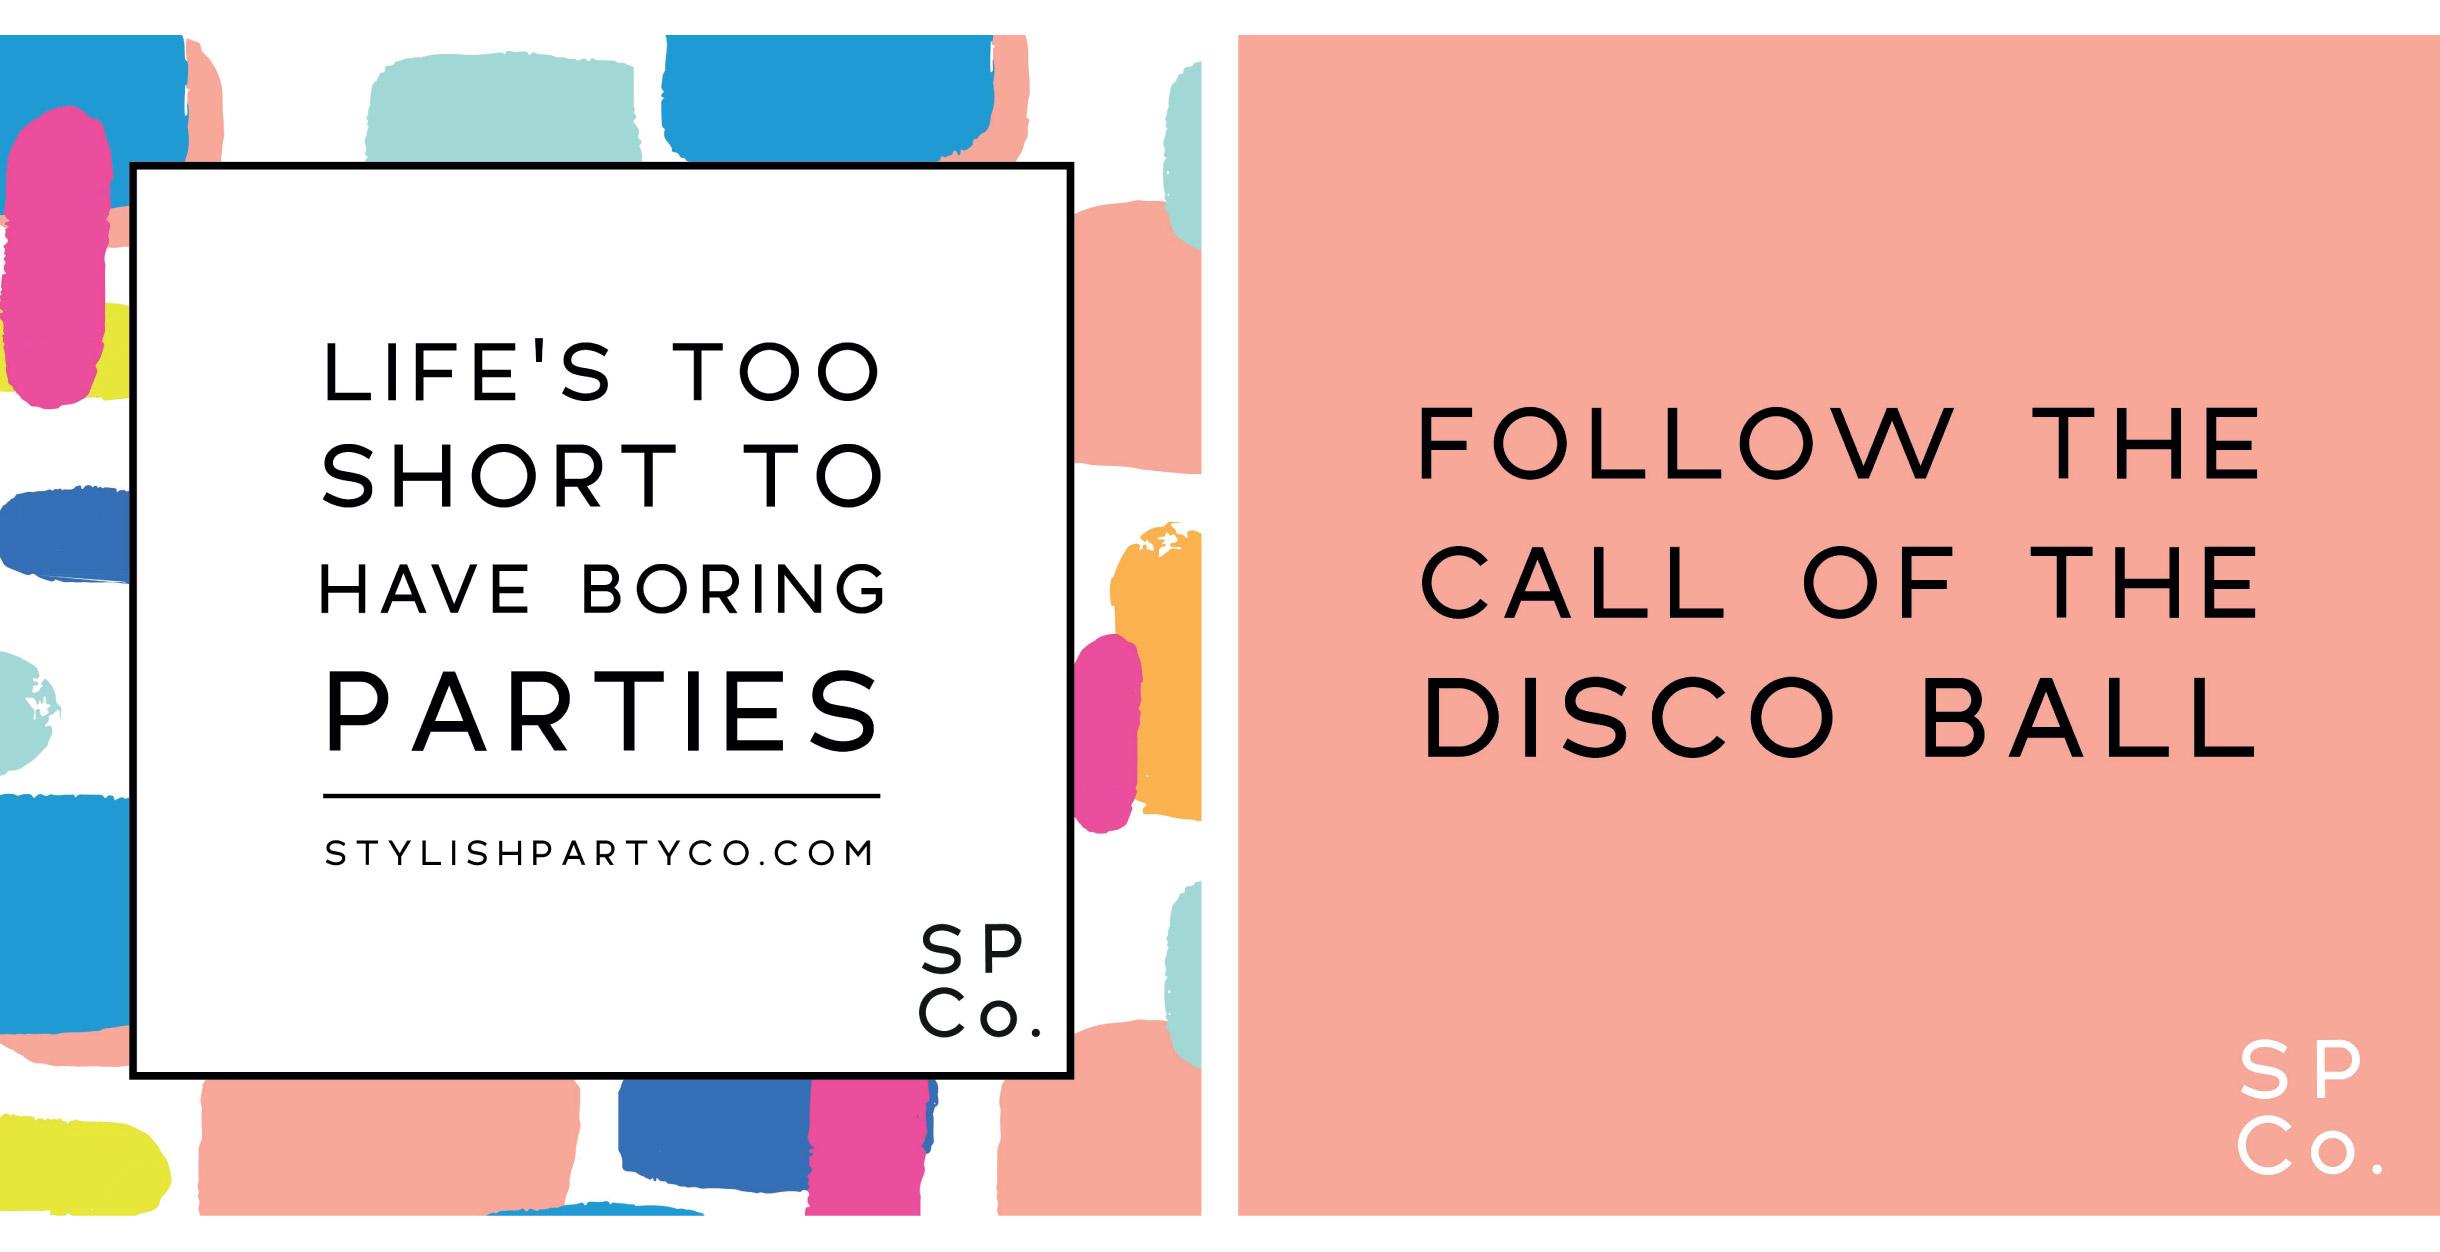 Quints Design co - Stylish Party co Branded Social Media Artworks